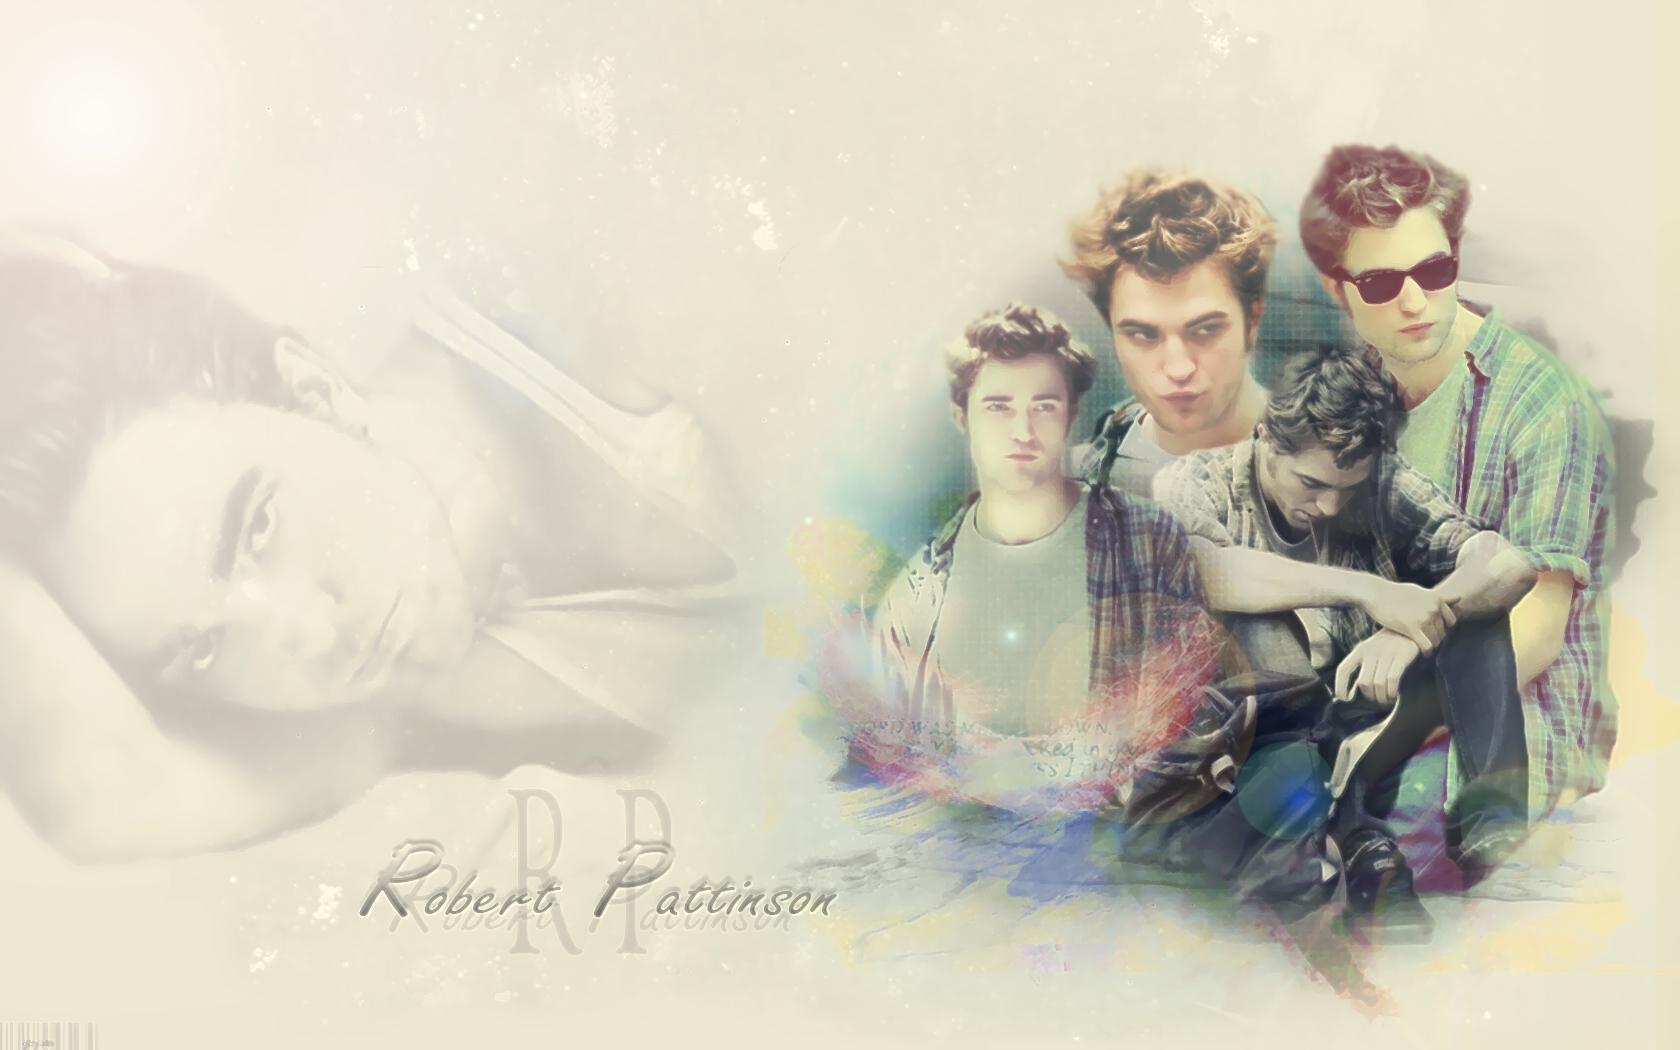 http://images2.fanpop.com/images/photos/6800000/Robert-Pattinson-Wallpaper-twilight-series-6806192-1680-1050.jpg